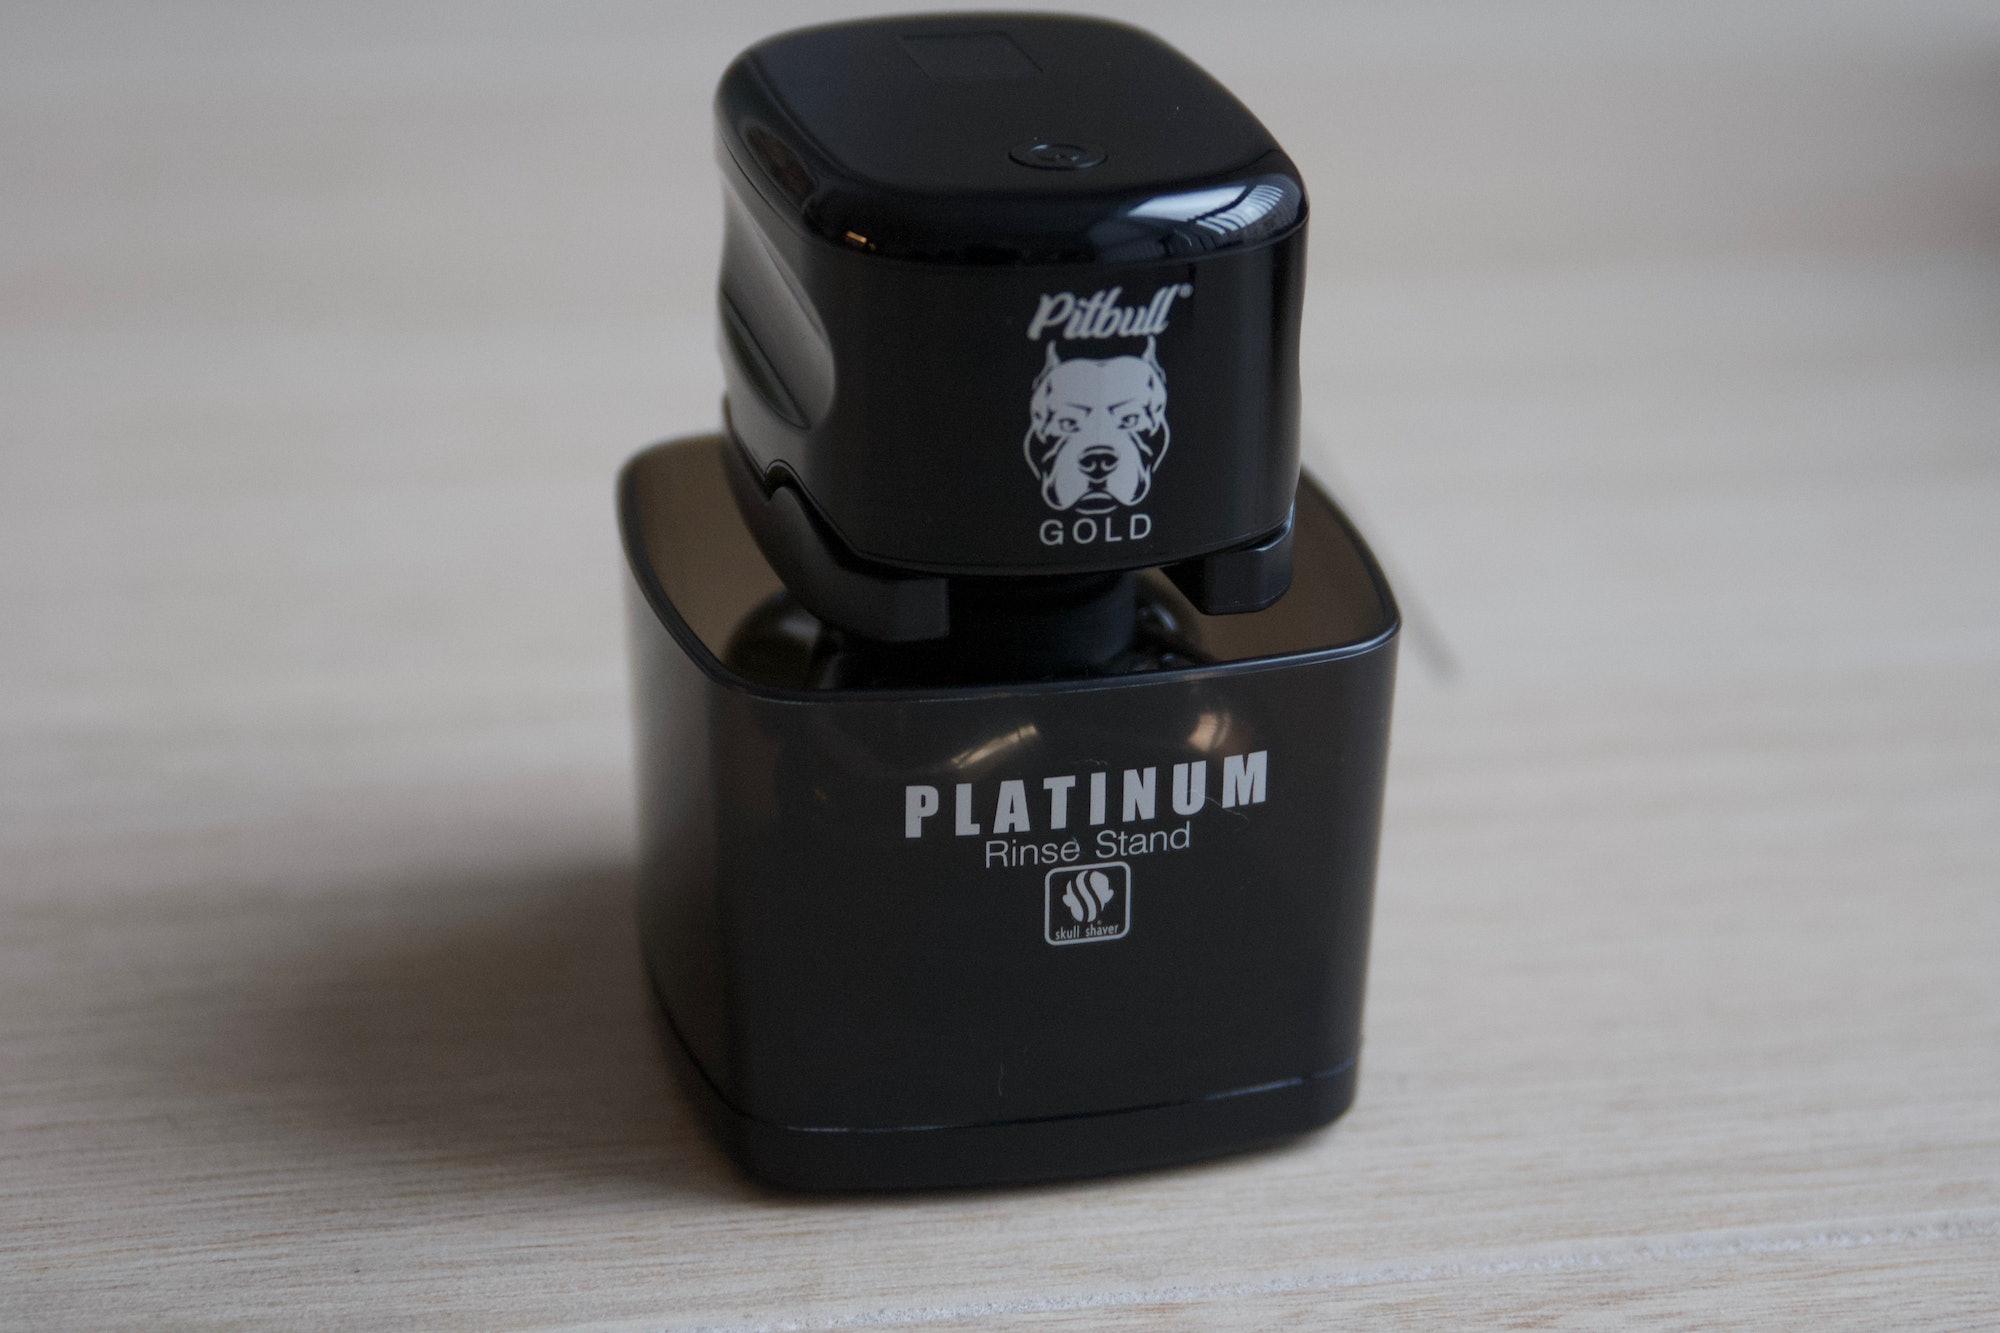 The Platinum rinse stand.